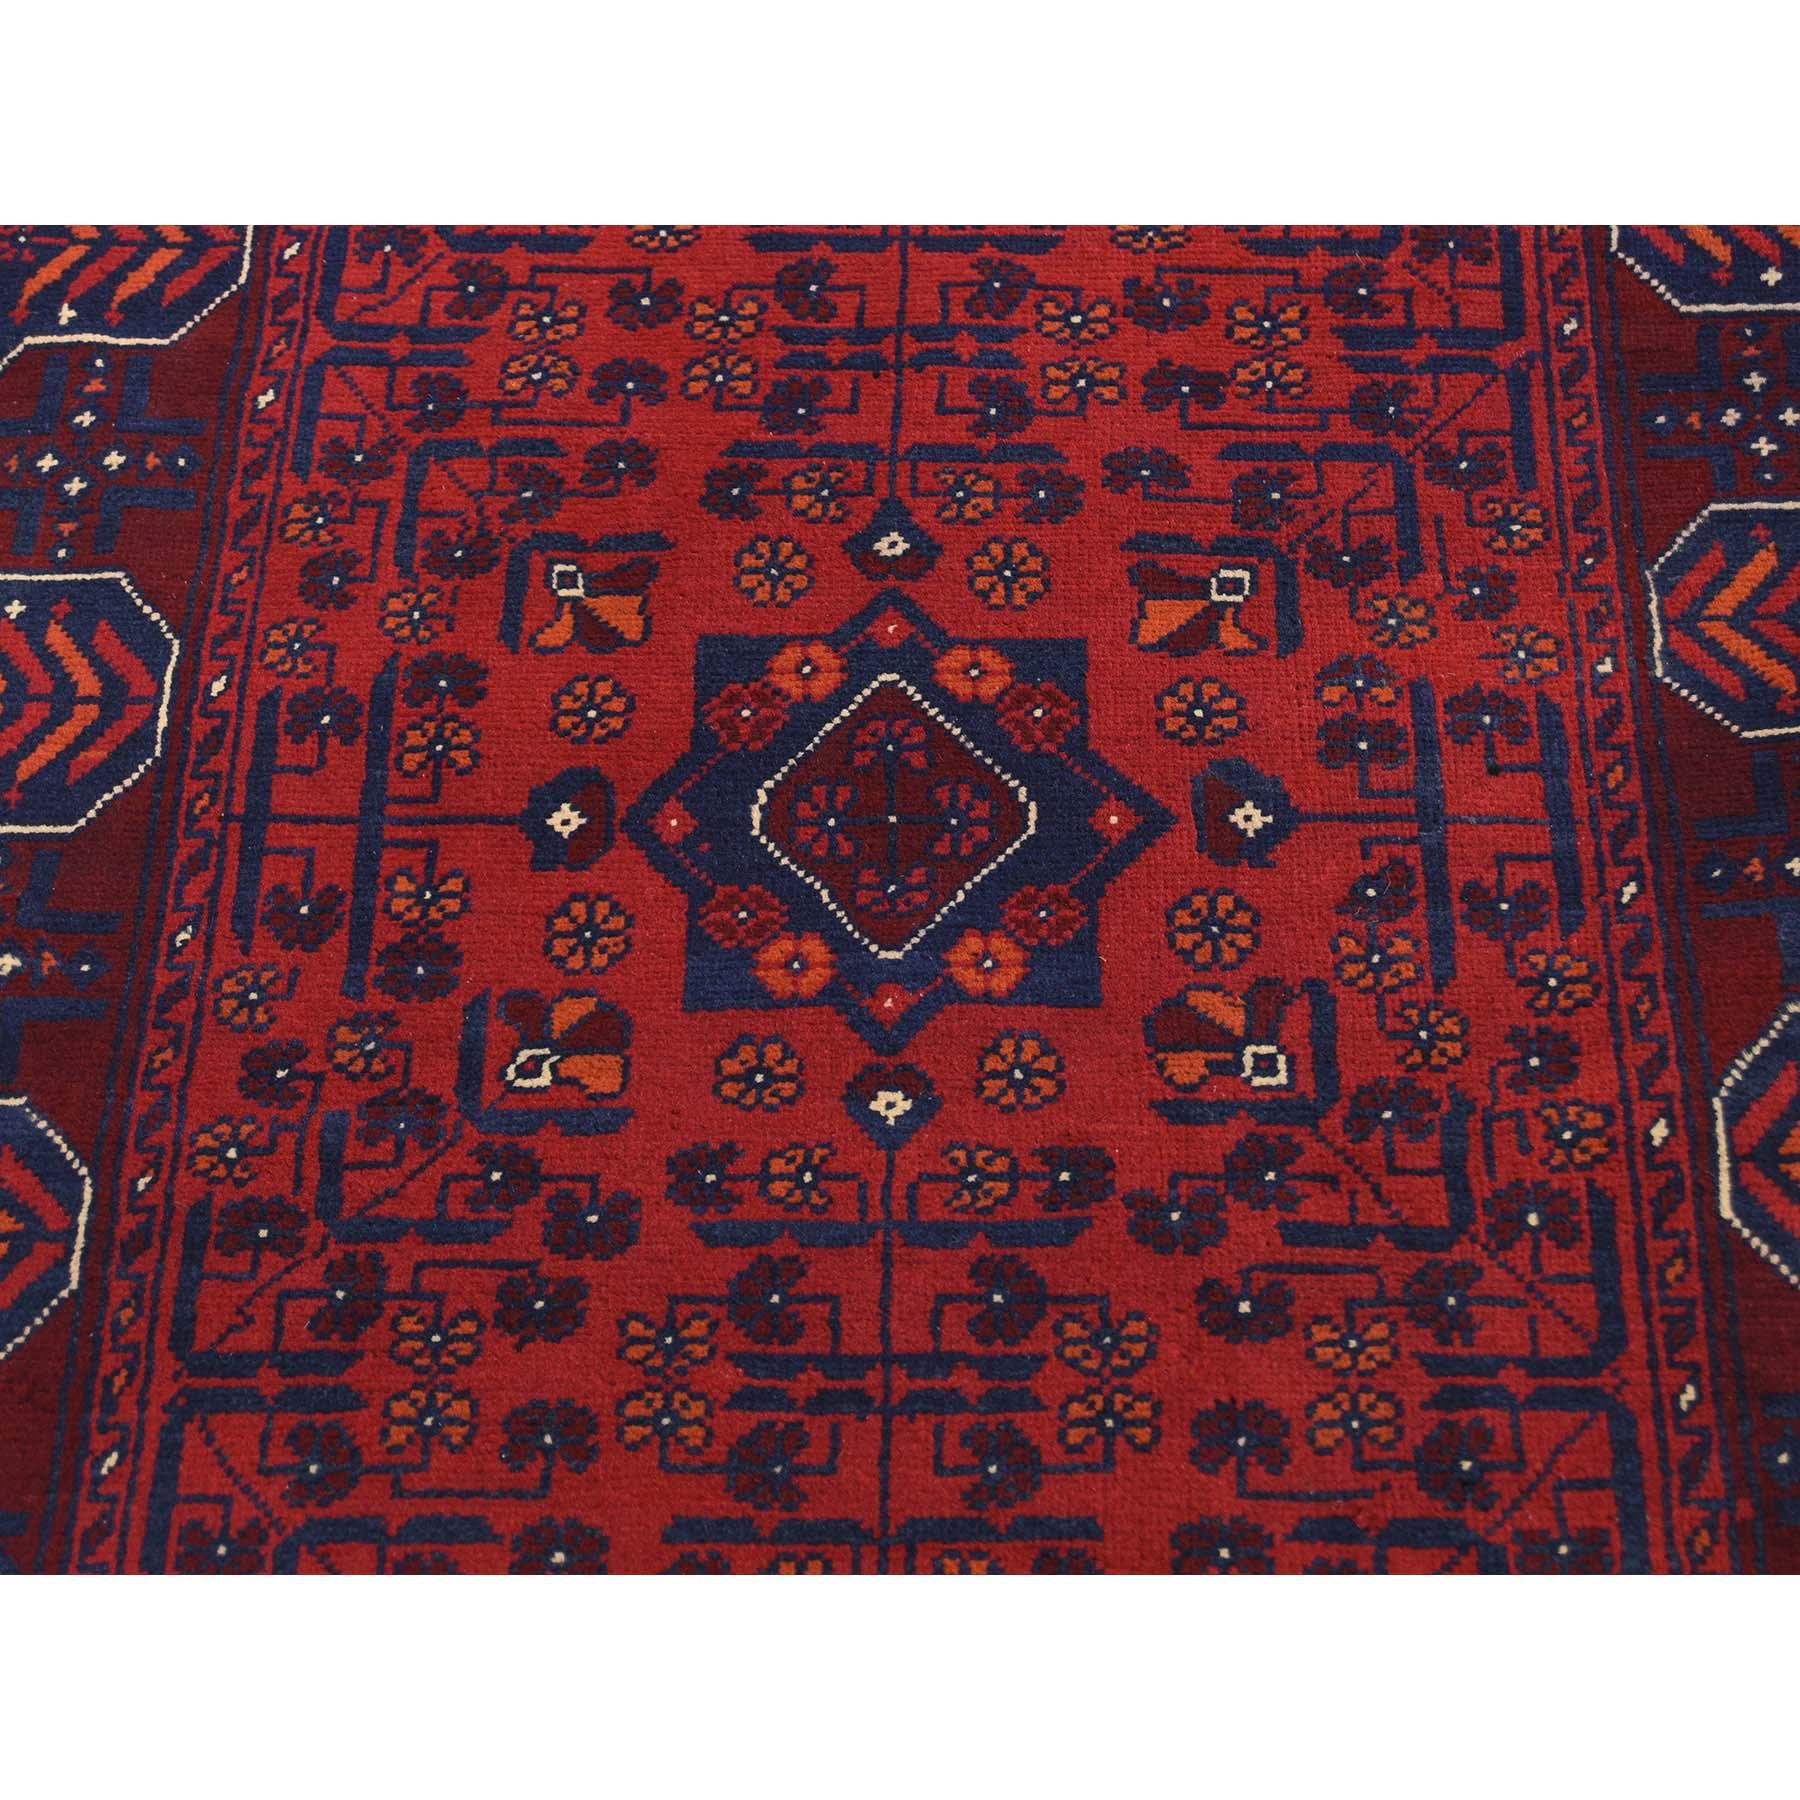 2-6 x31-8  Afghan Khamyab Silky Wool XL Runner Hand-Knotted Oriental Rug